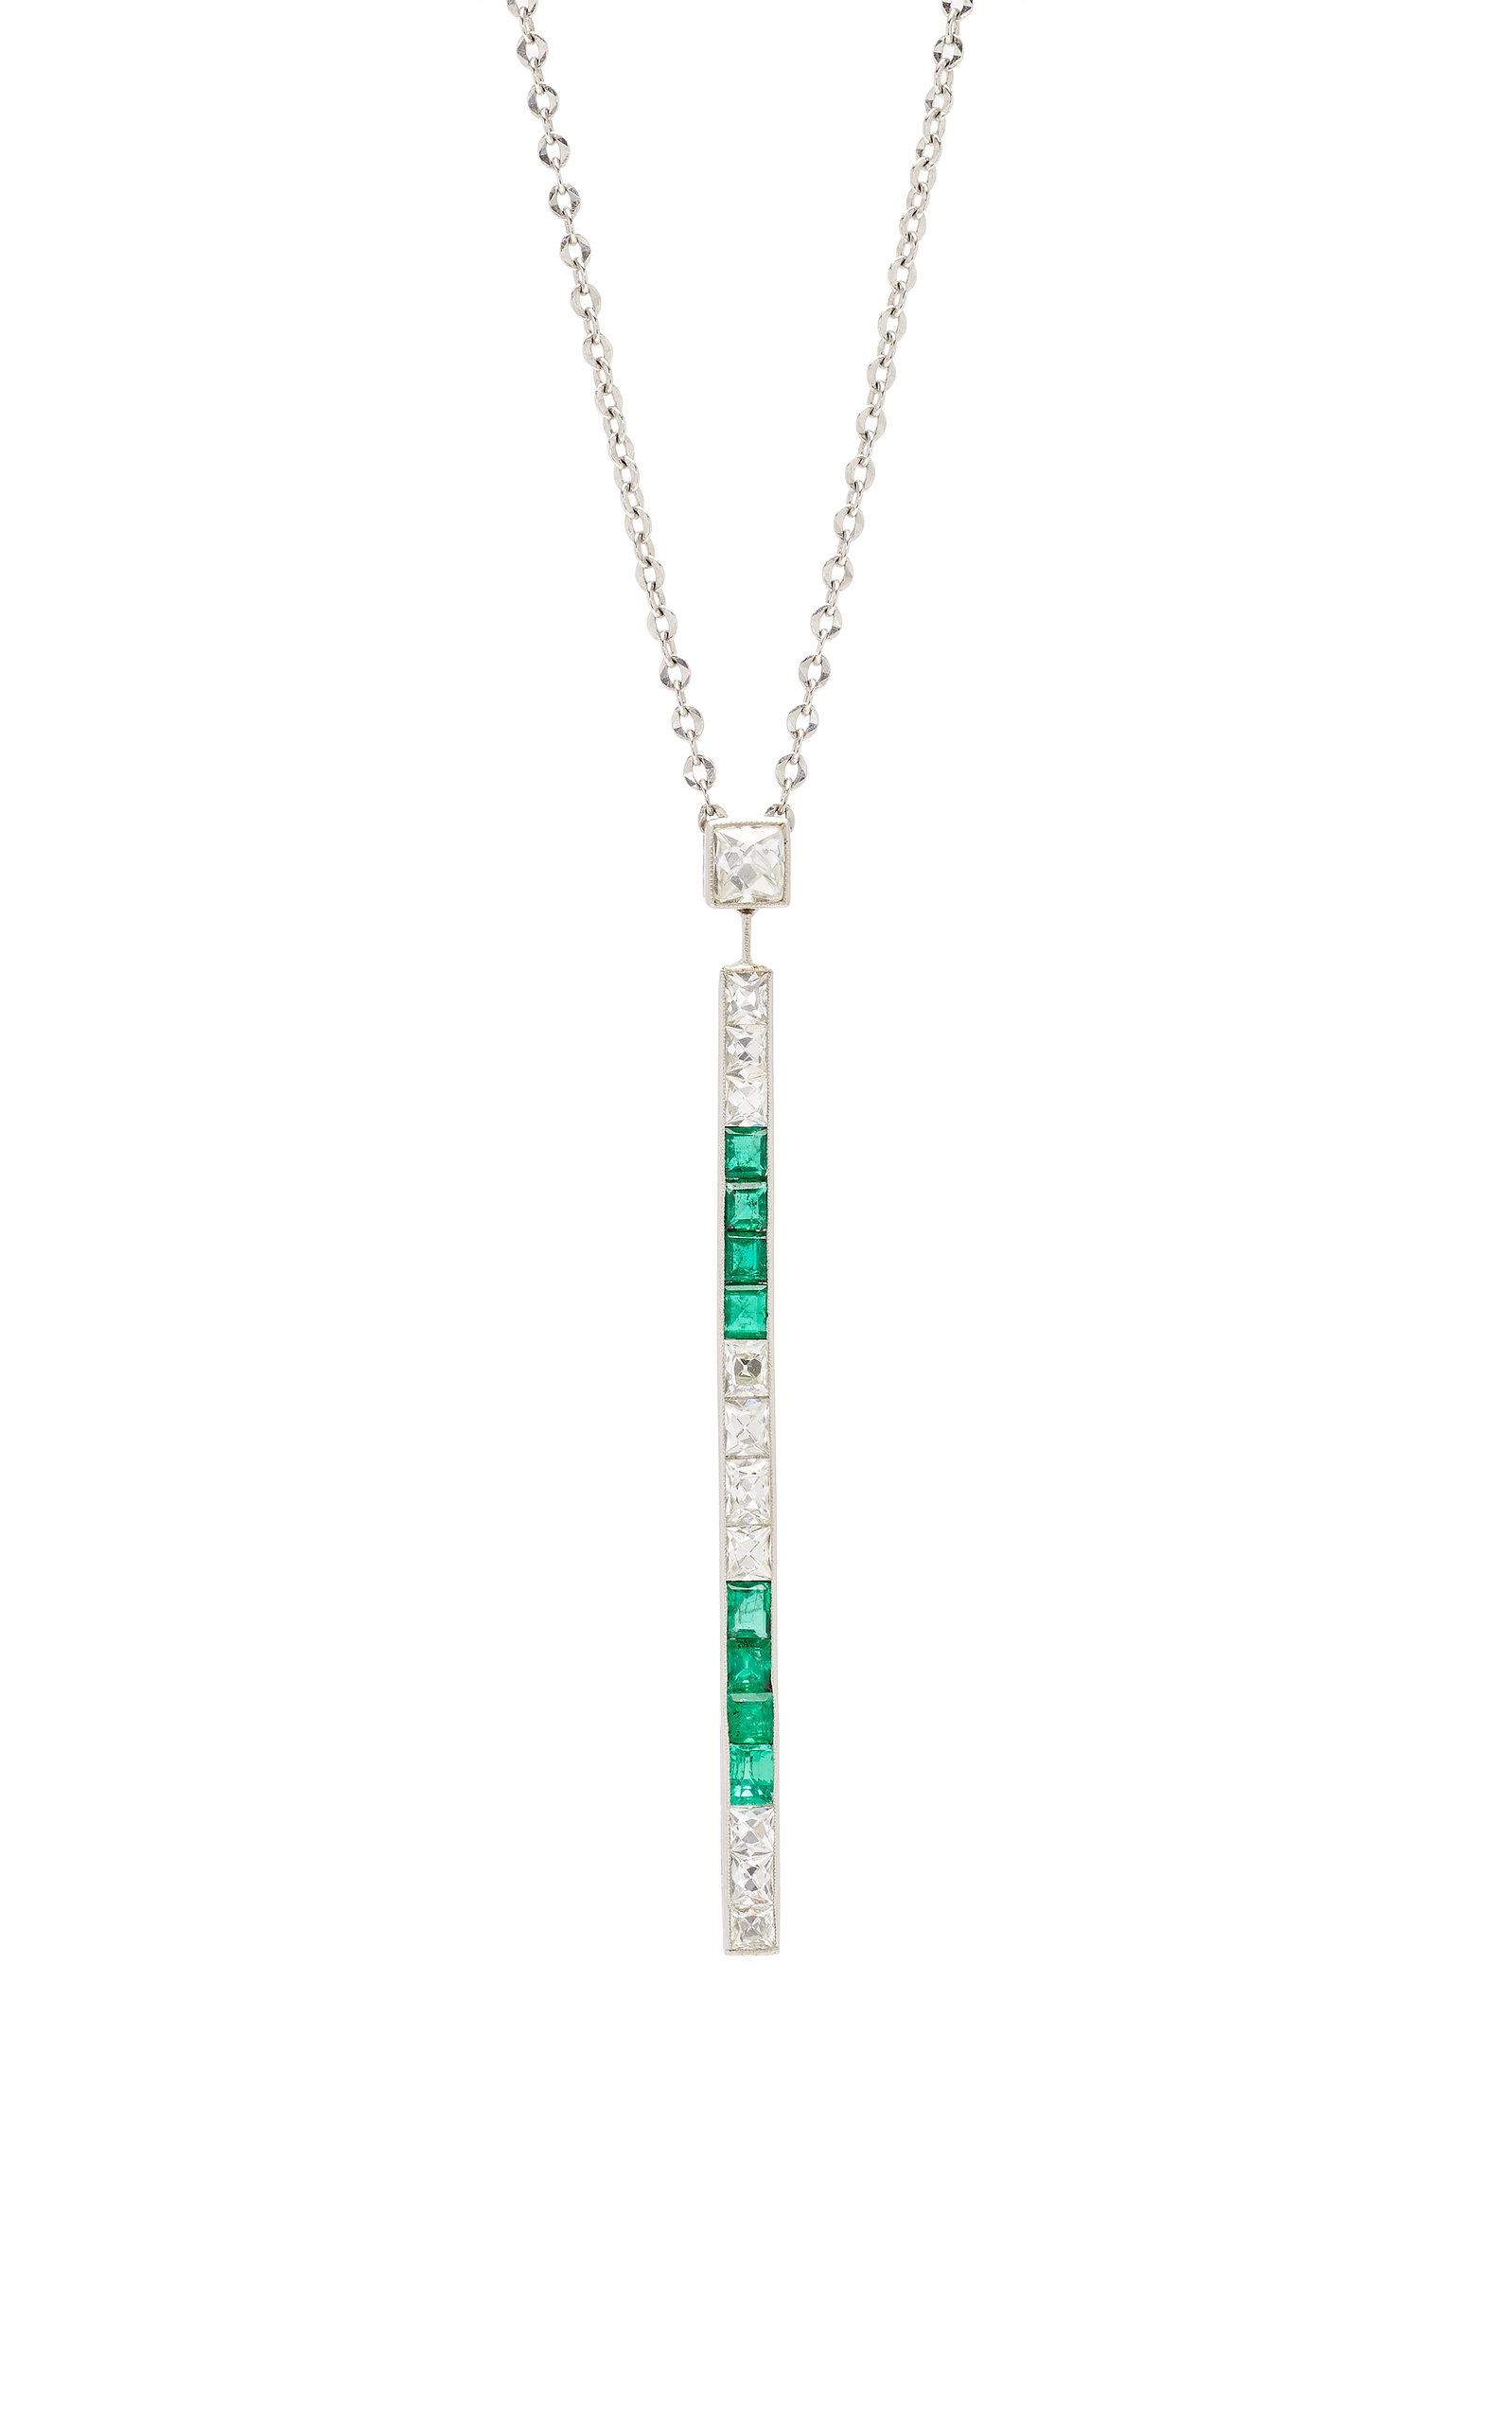 401715b8ac977 Vintage Art Deco Tiffany & Co. Diamond Bar Pendant